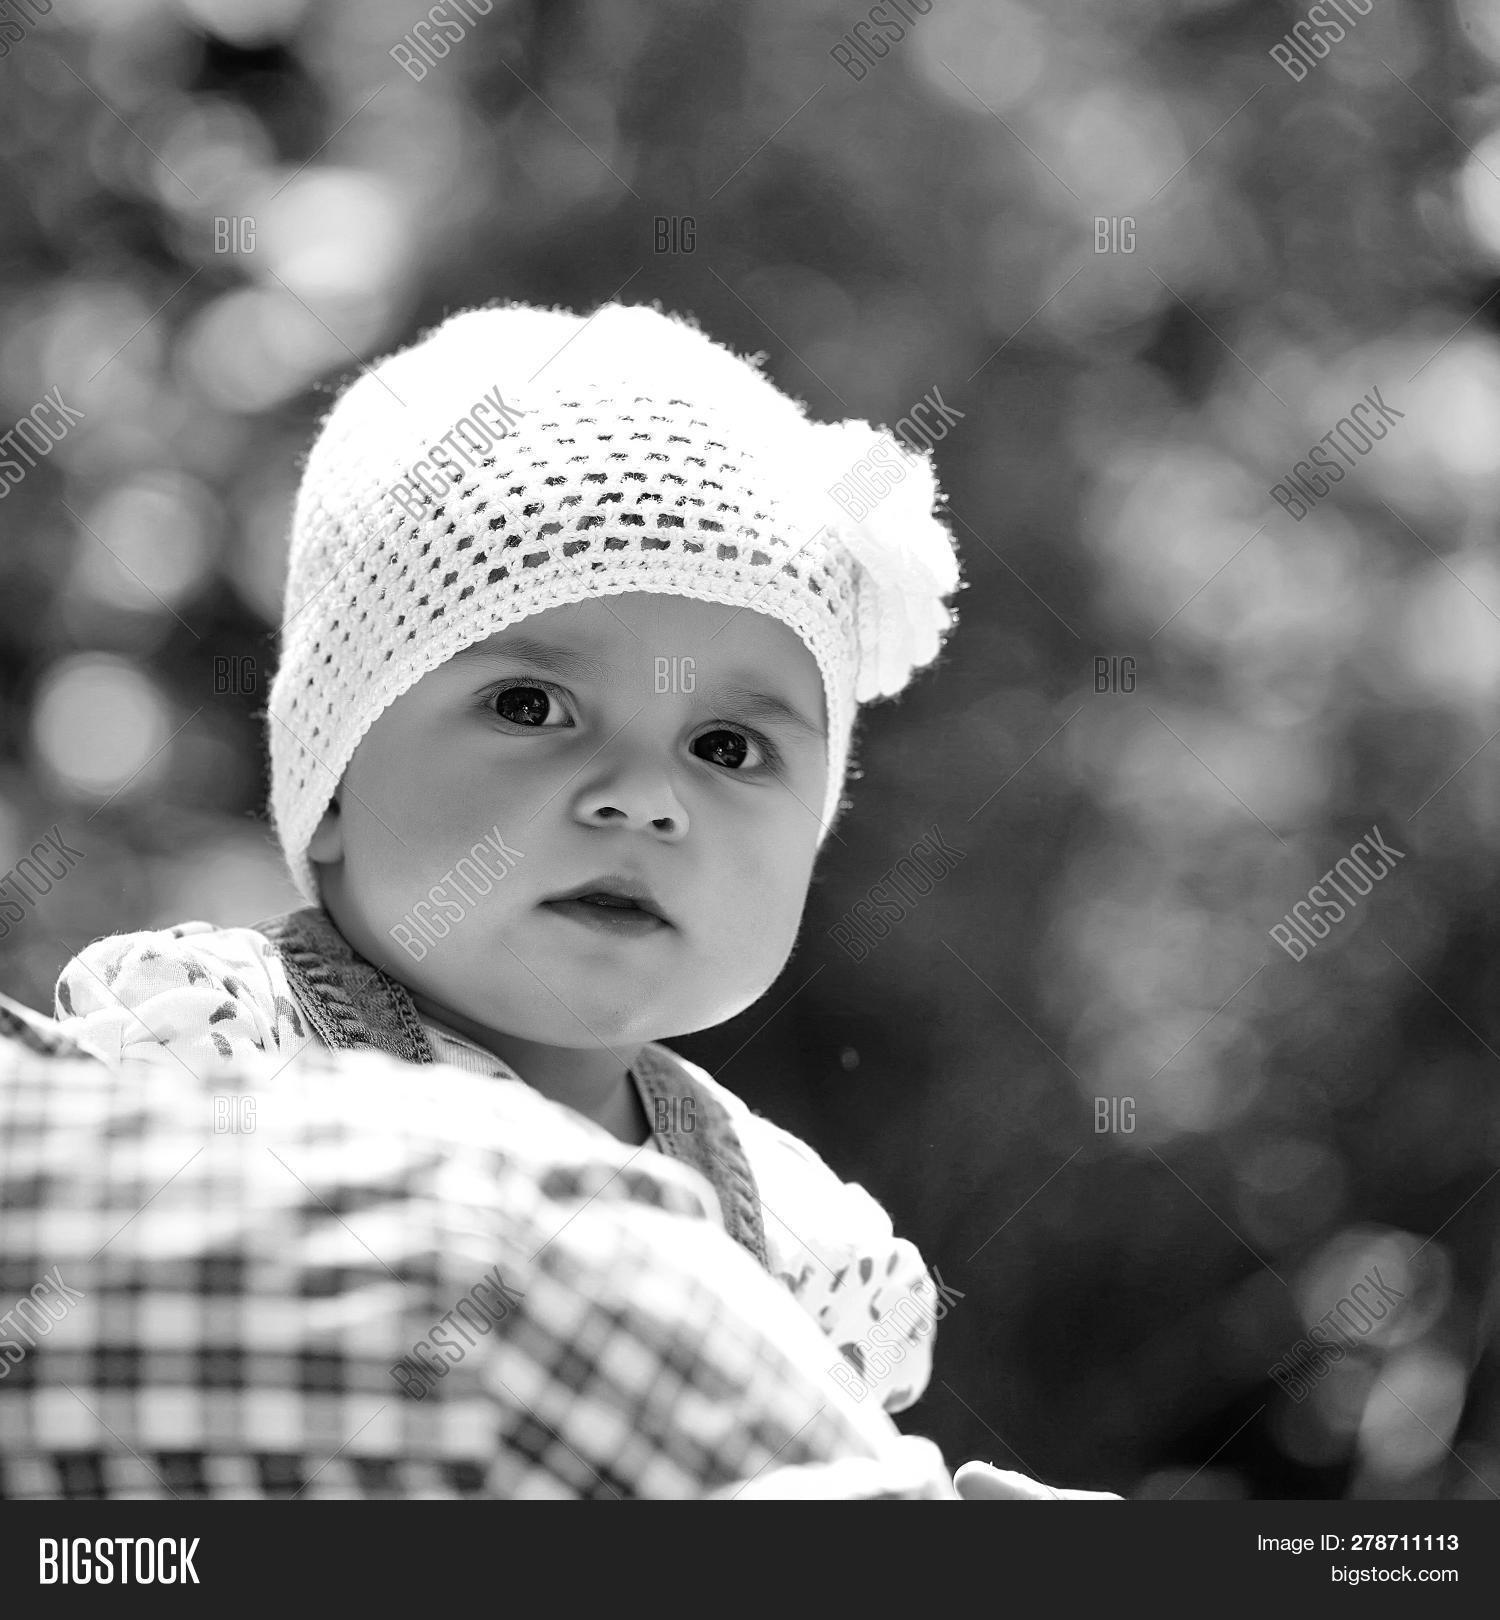 530df992dc4 🔥 Baby Girl Cute Hazel-eyed Kid Tiny Little Child Wearing White ...